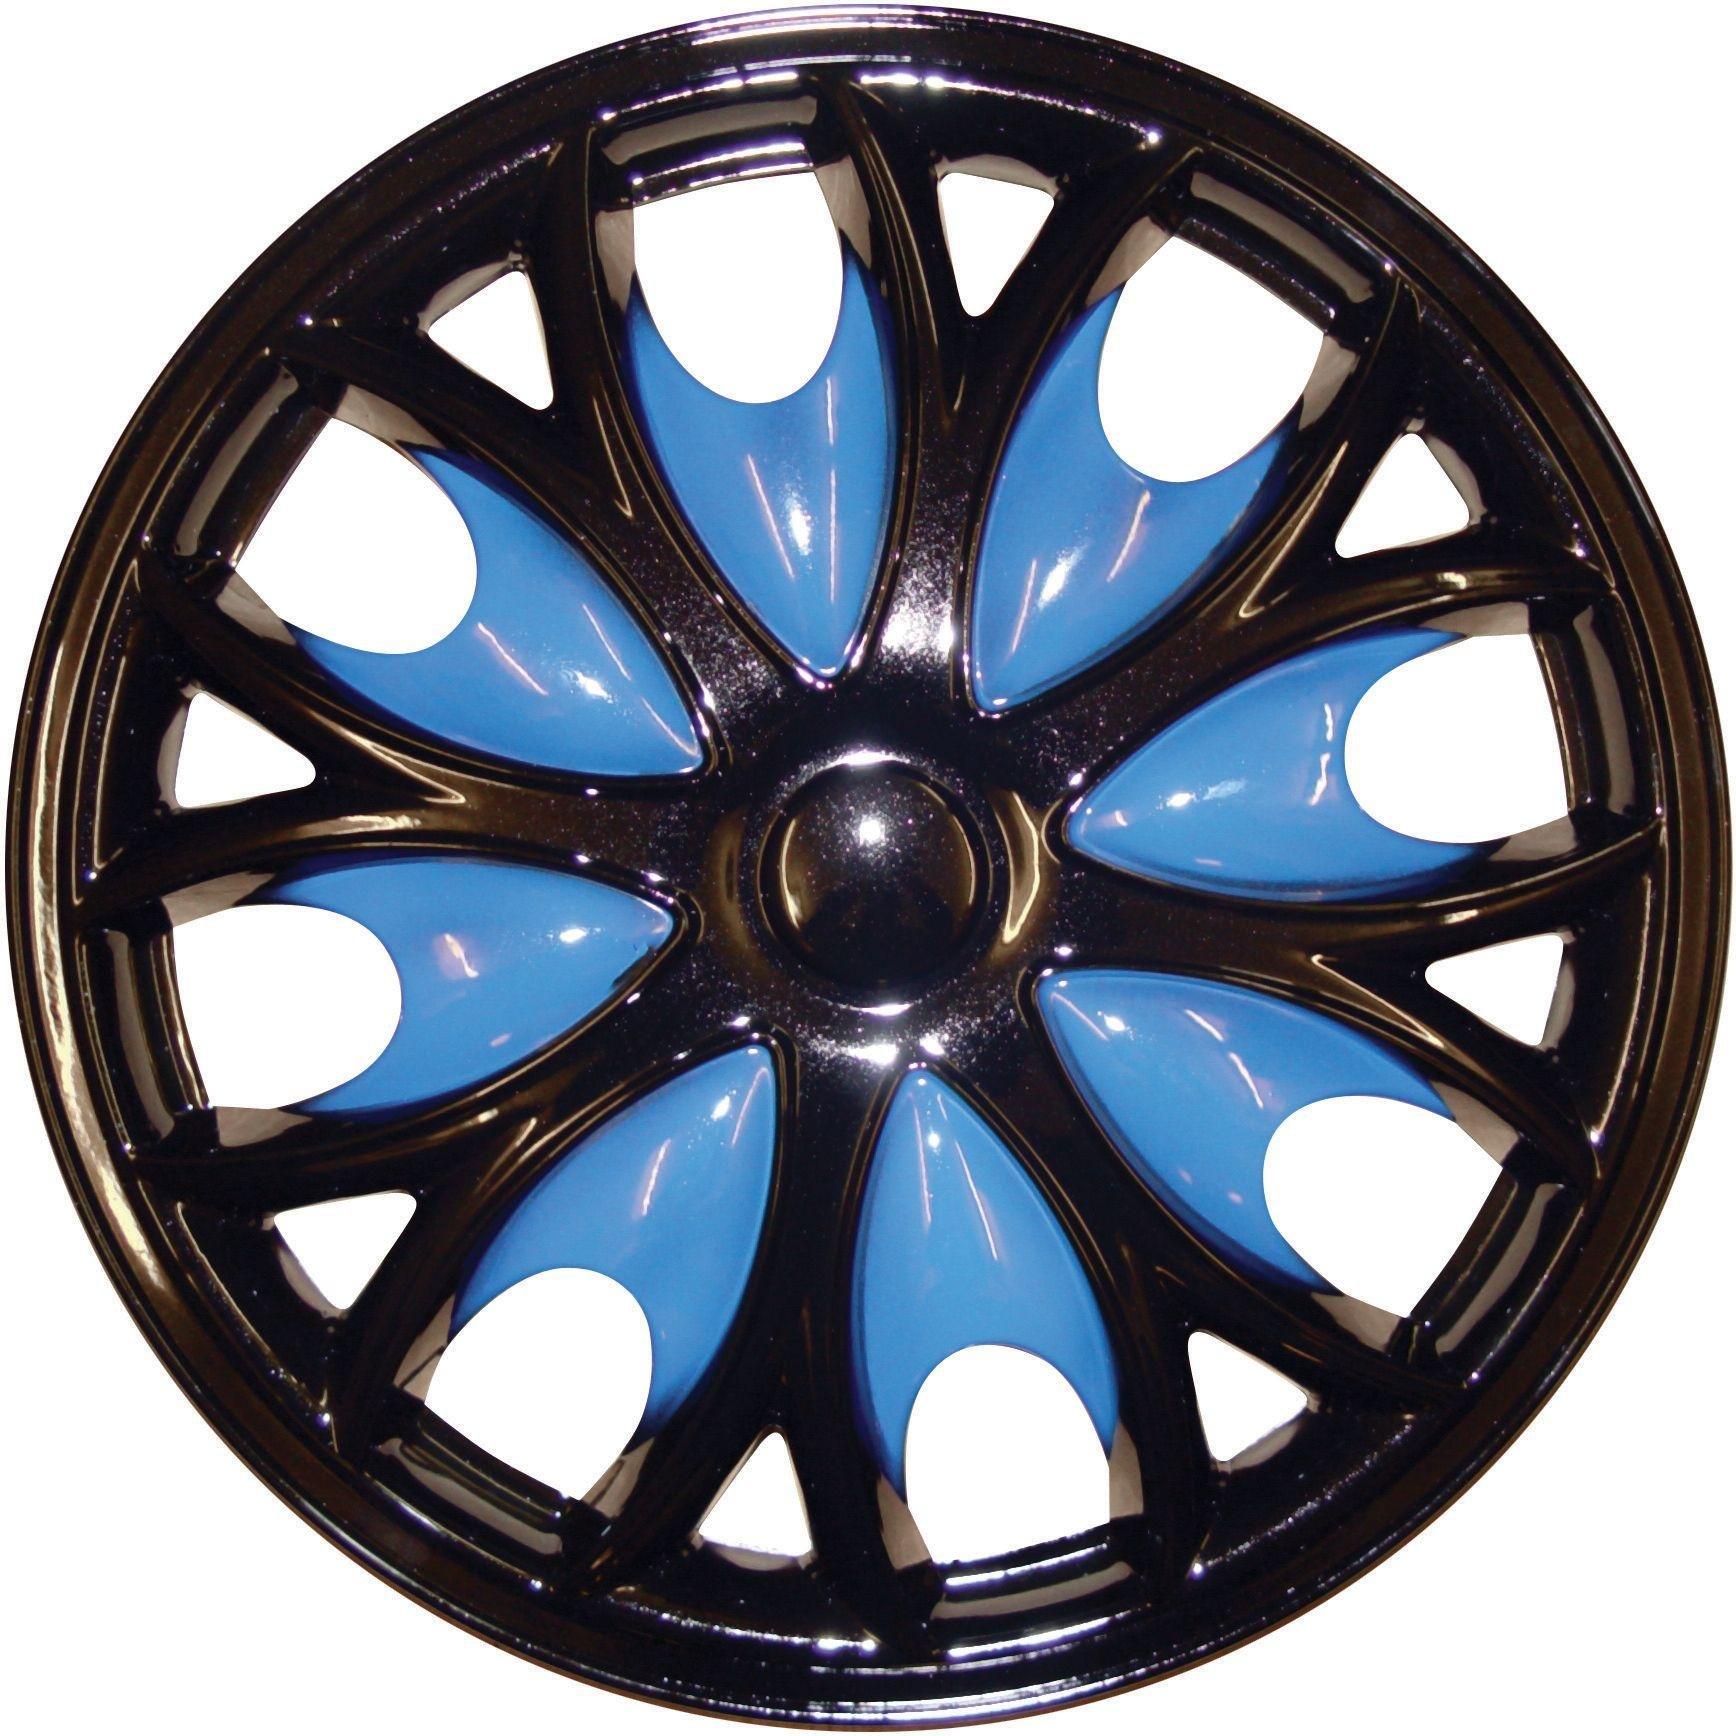 Cosmos Shark 15-inch Wheel Trim Set - Black and Blue